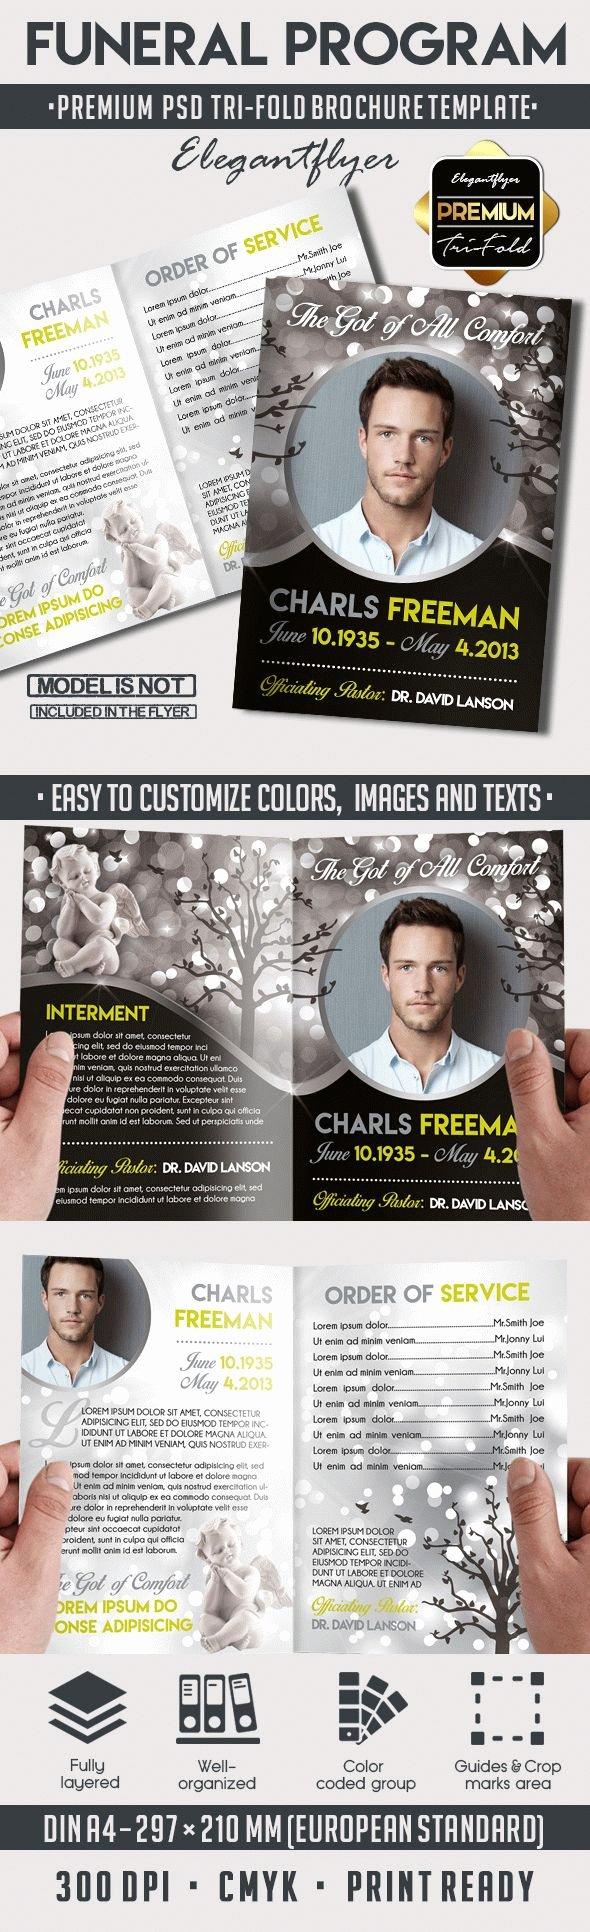 Tri Fold Program Template Best Of Elegant Memories Funeral Program Brochure – by Elegantflyer